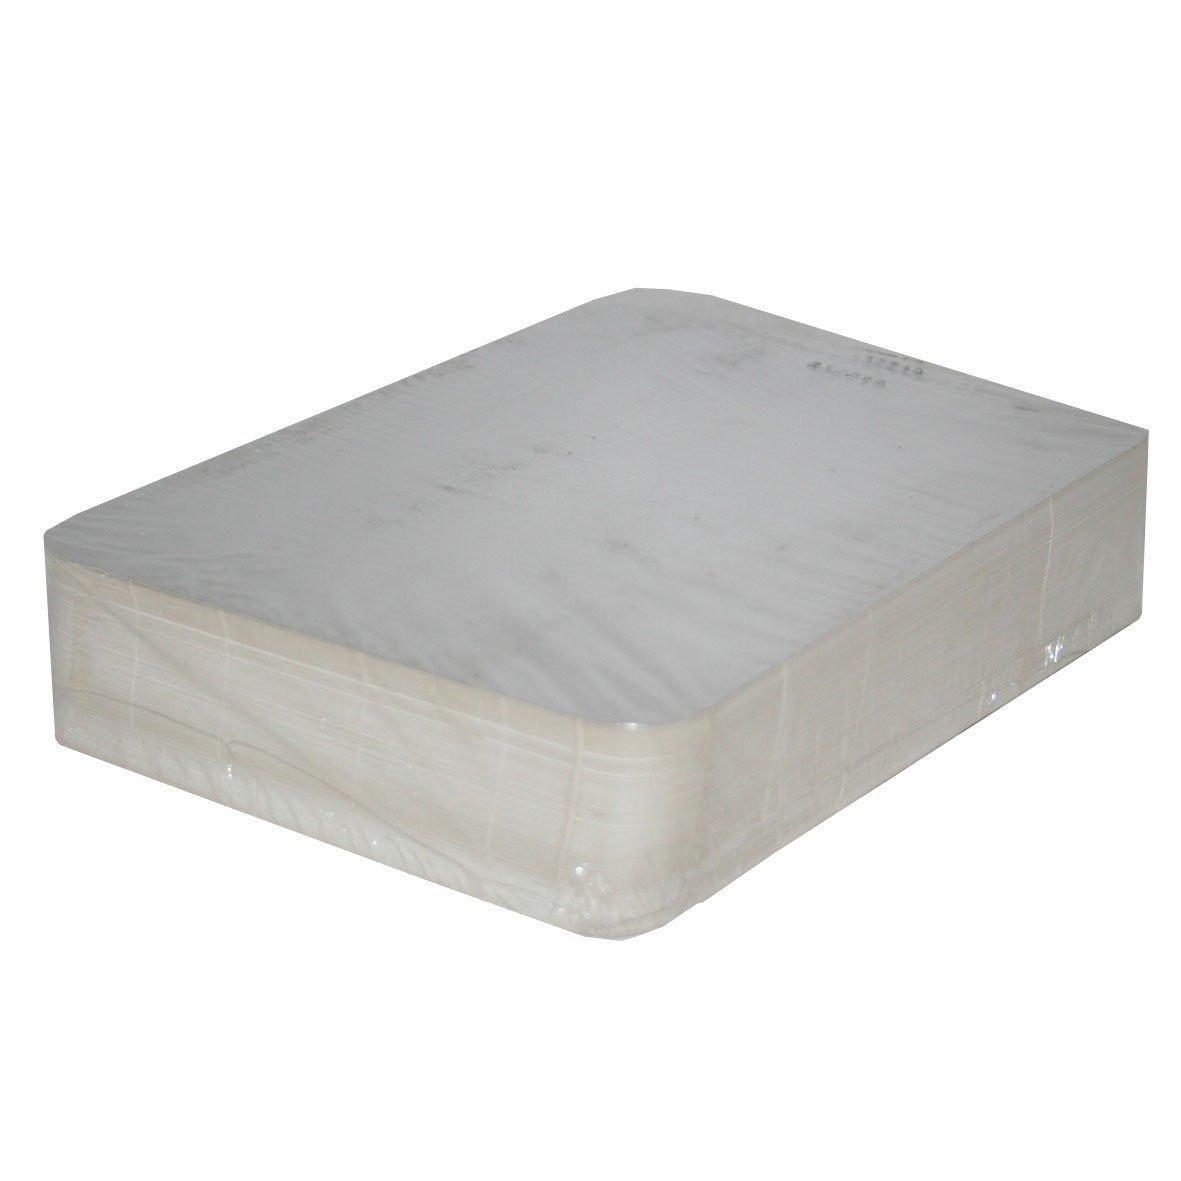 Крышка к алюминиевой форме 212x149мм, картон/алюминий, 1000 шт